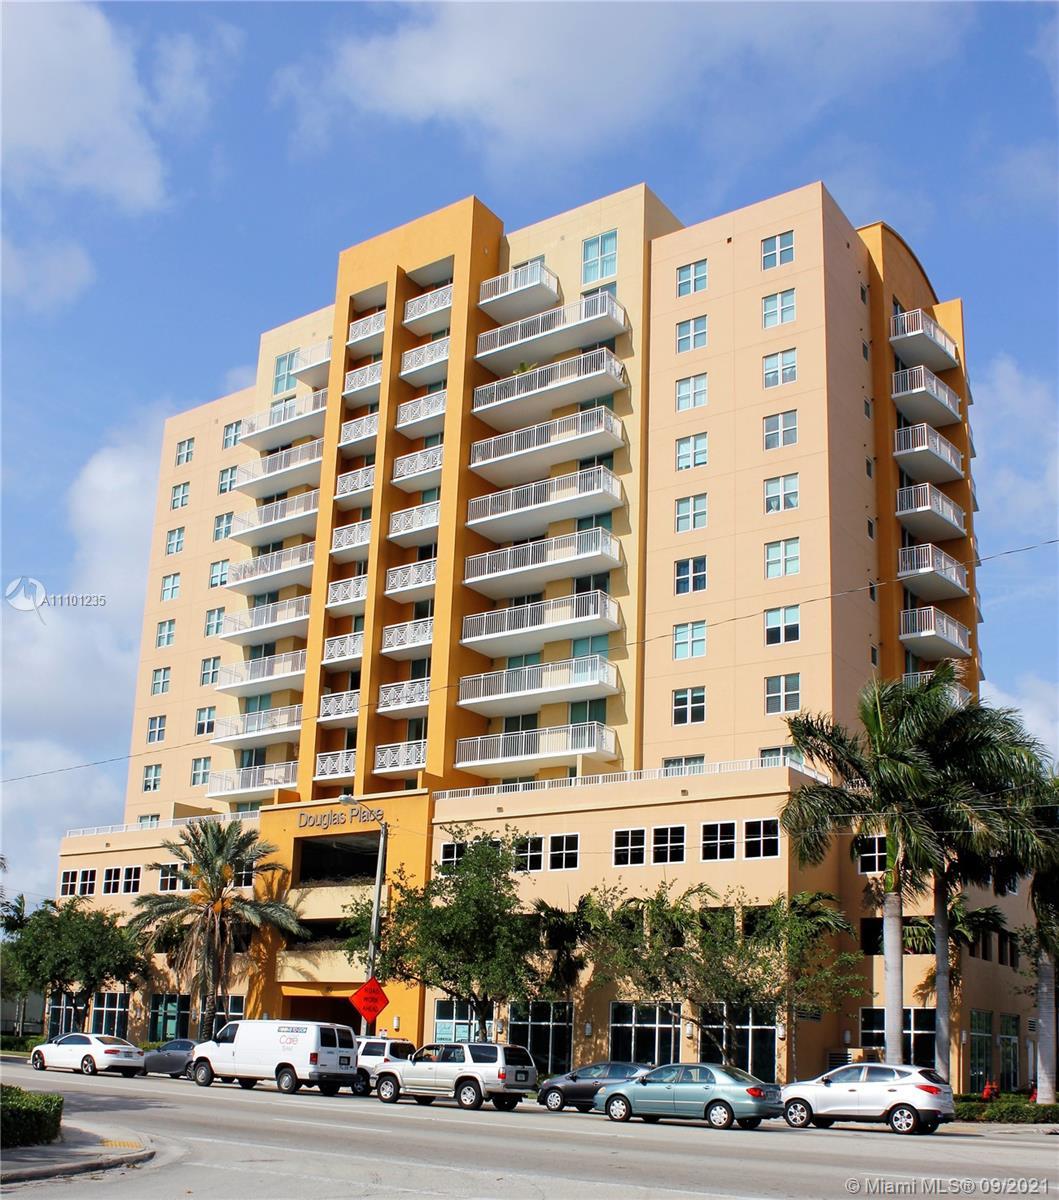 DOUGLAS PLACE CONDO Condo,For Rent,DOUGLAS PLACE CONDO Brickell,realty,broker,condos near me